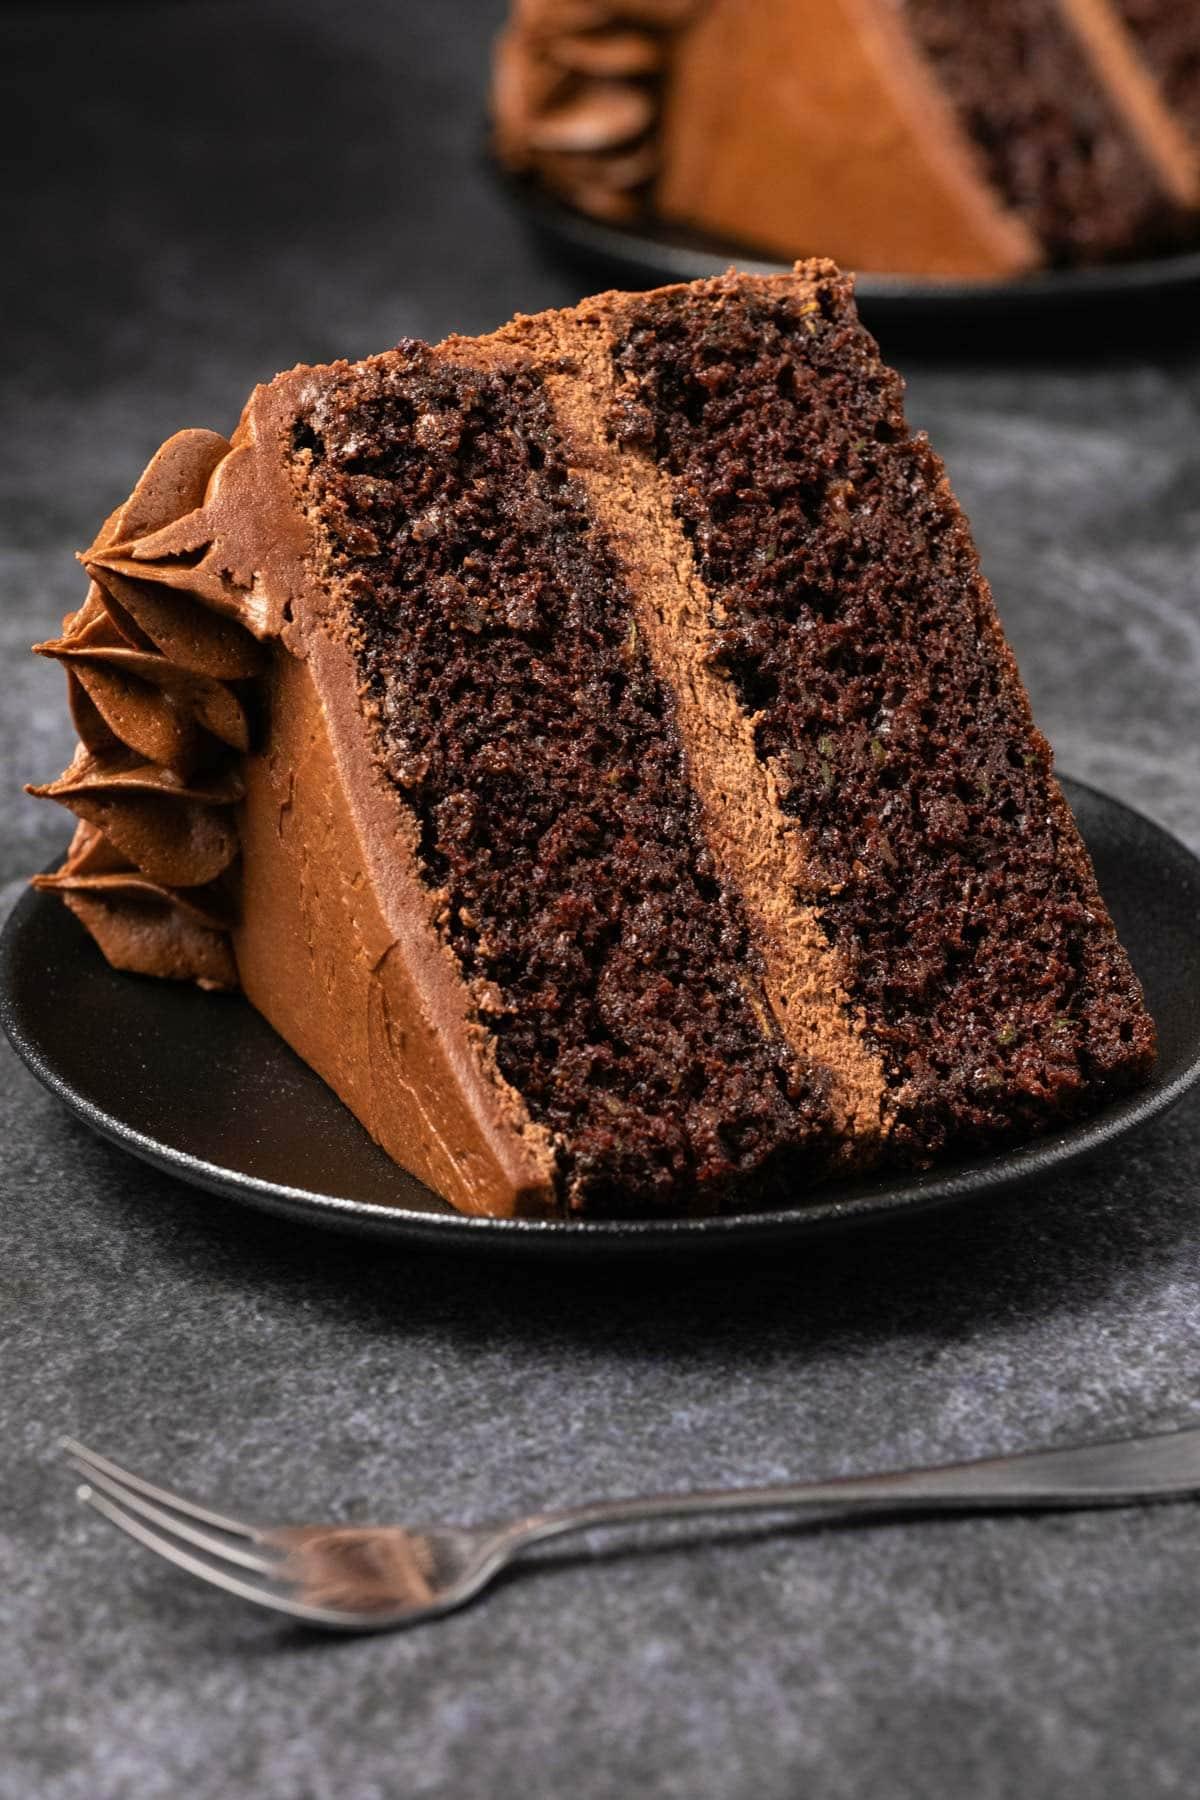 Slice of chocolate zucchini cake on a black plate.